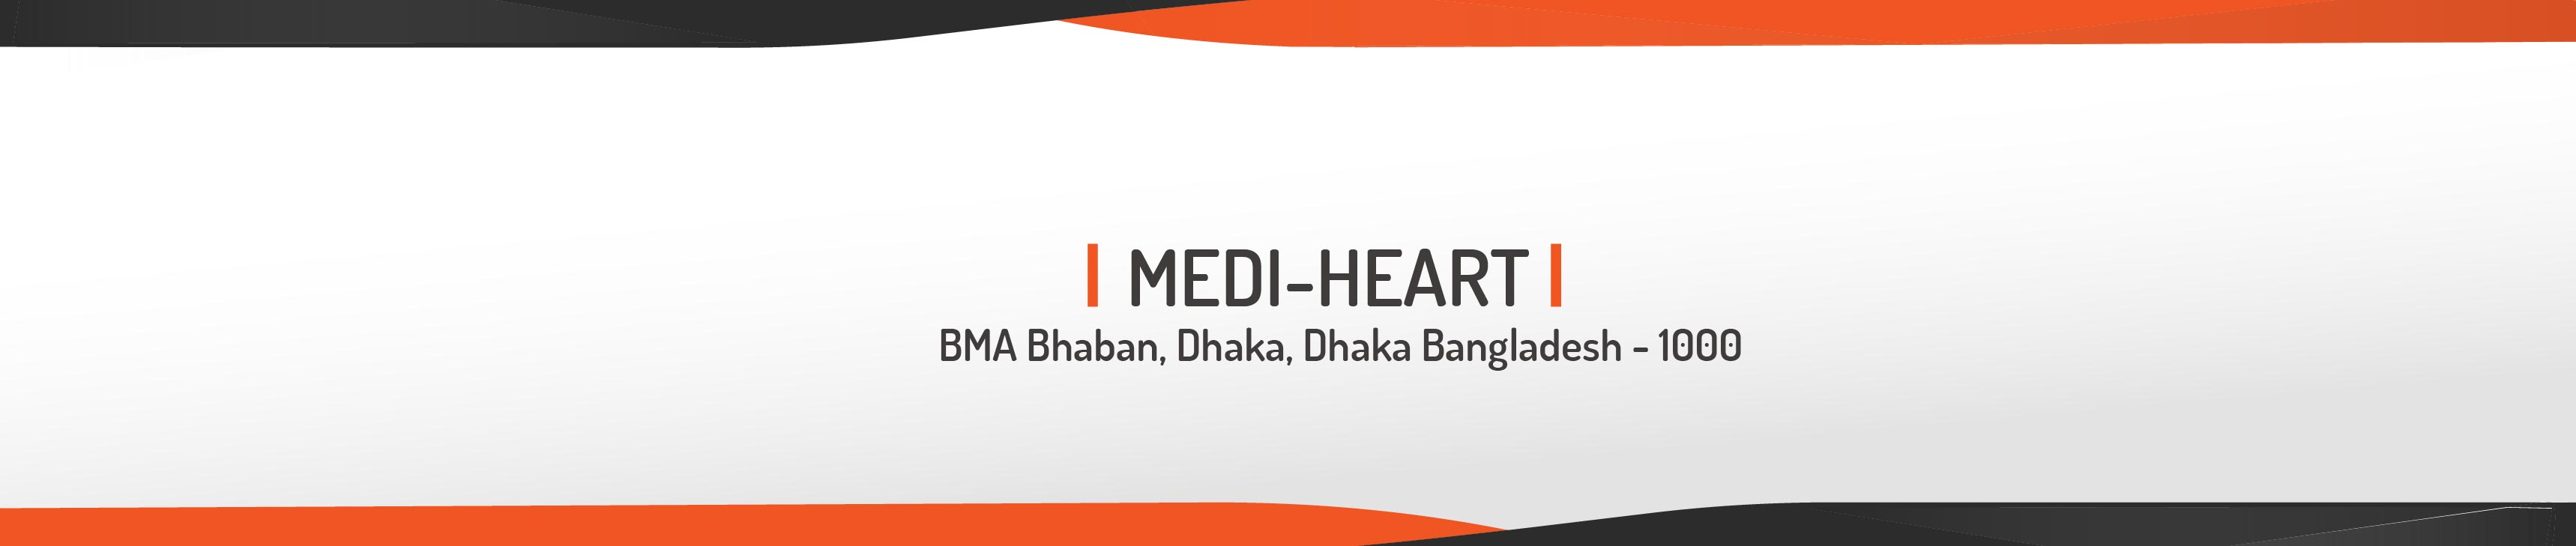 MEDI-HEART